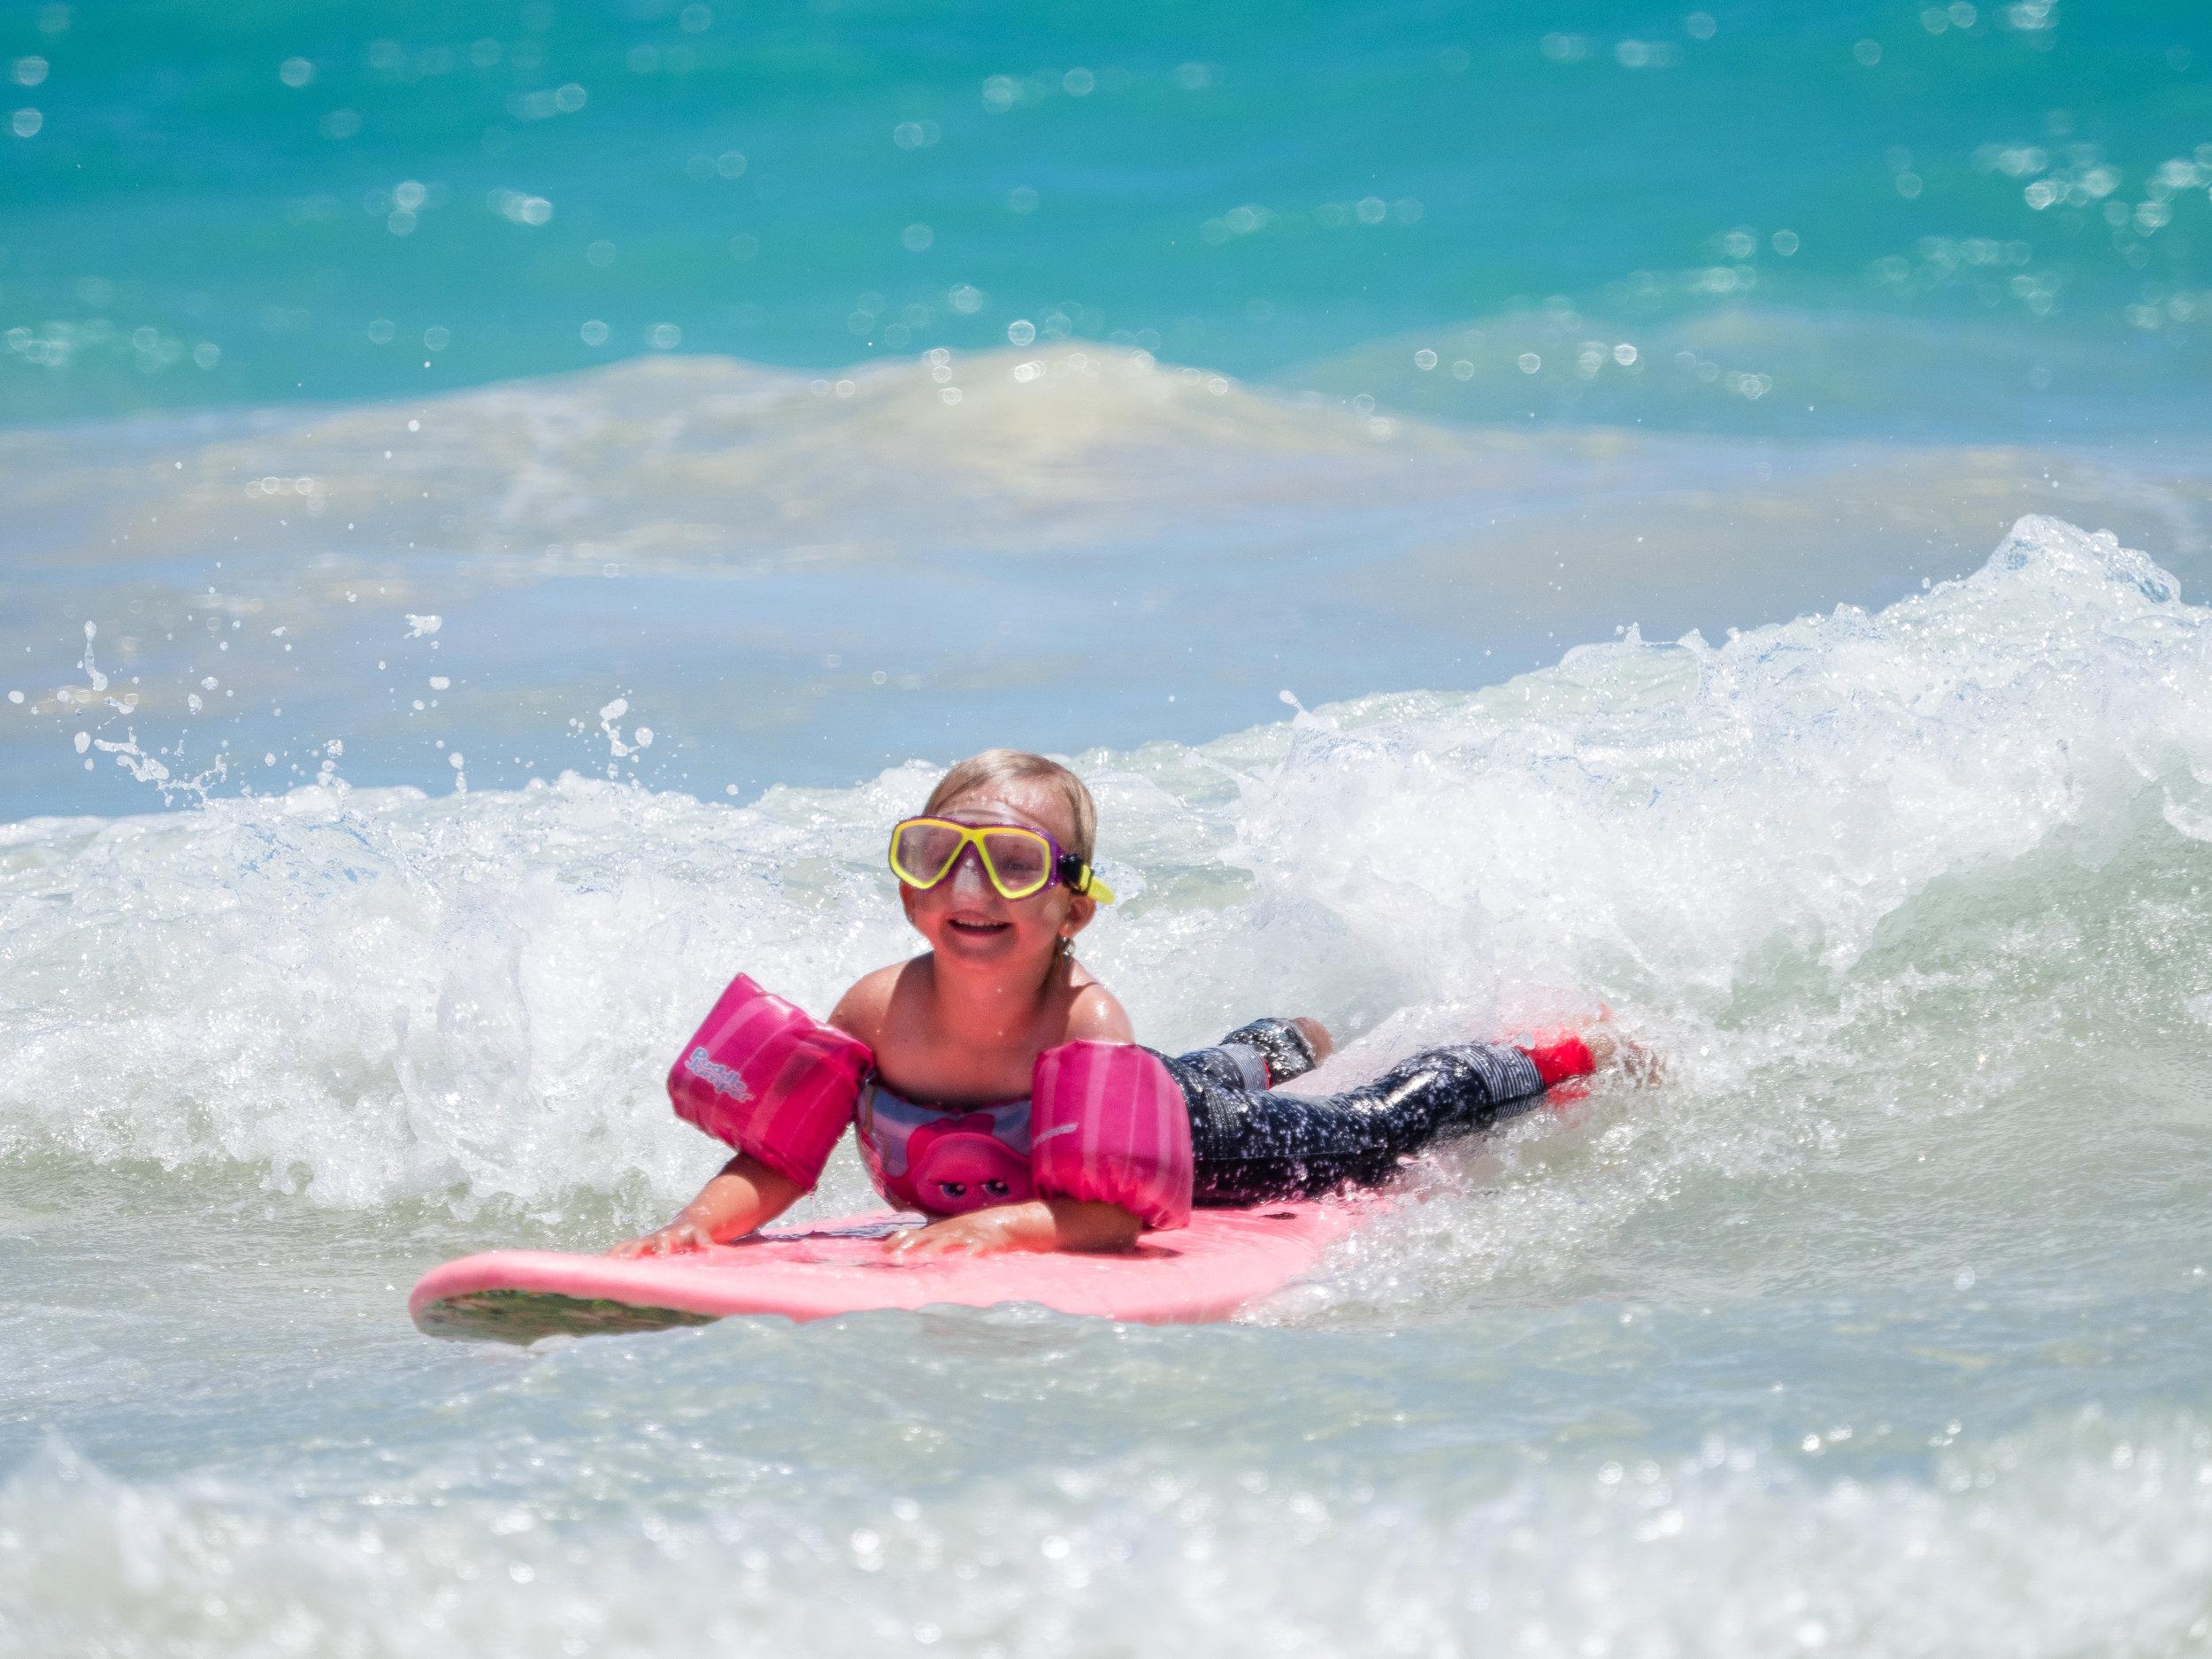 Kailua Shorebreak Classic - Fun for all ages and abilities